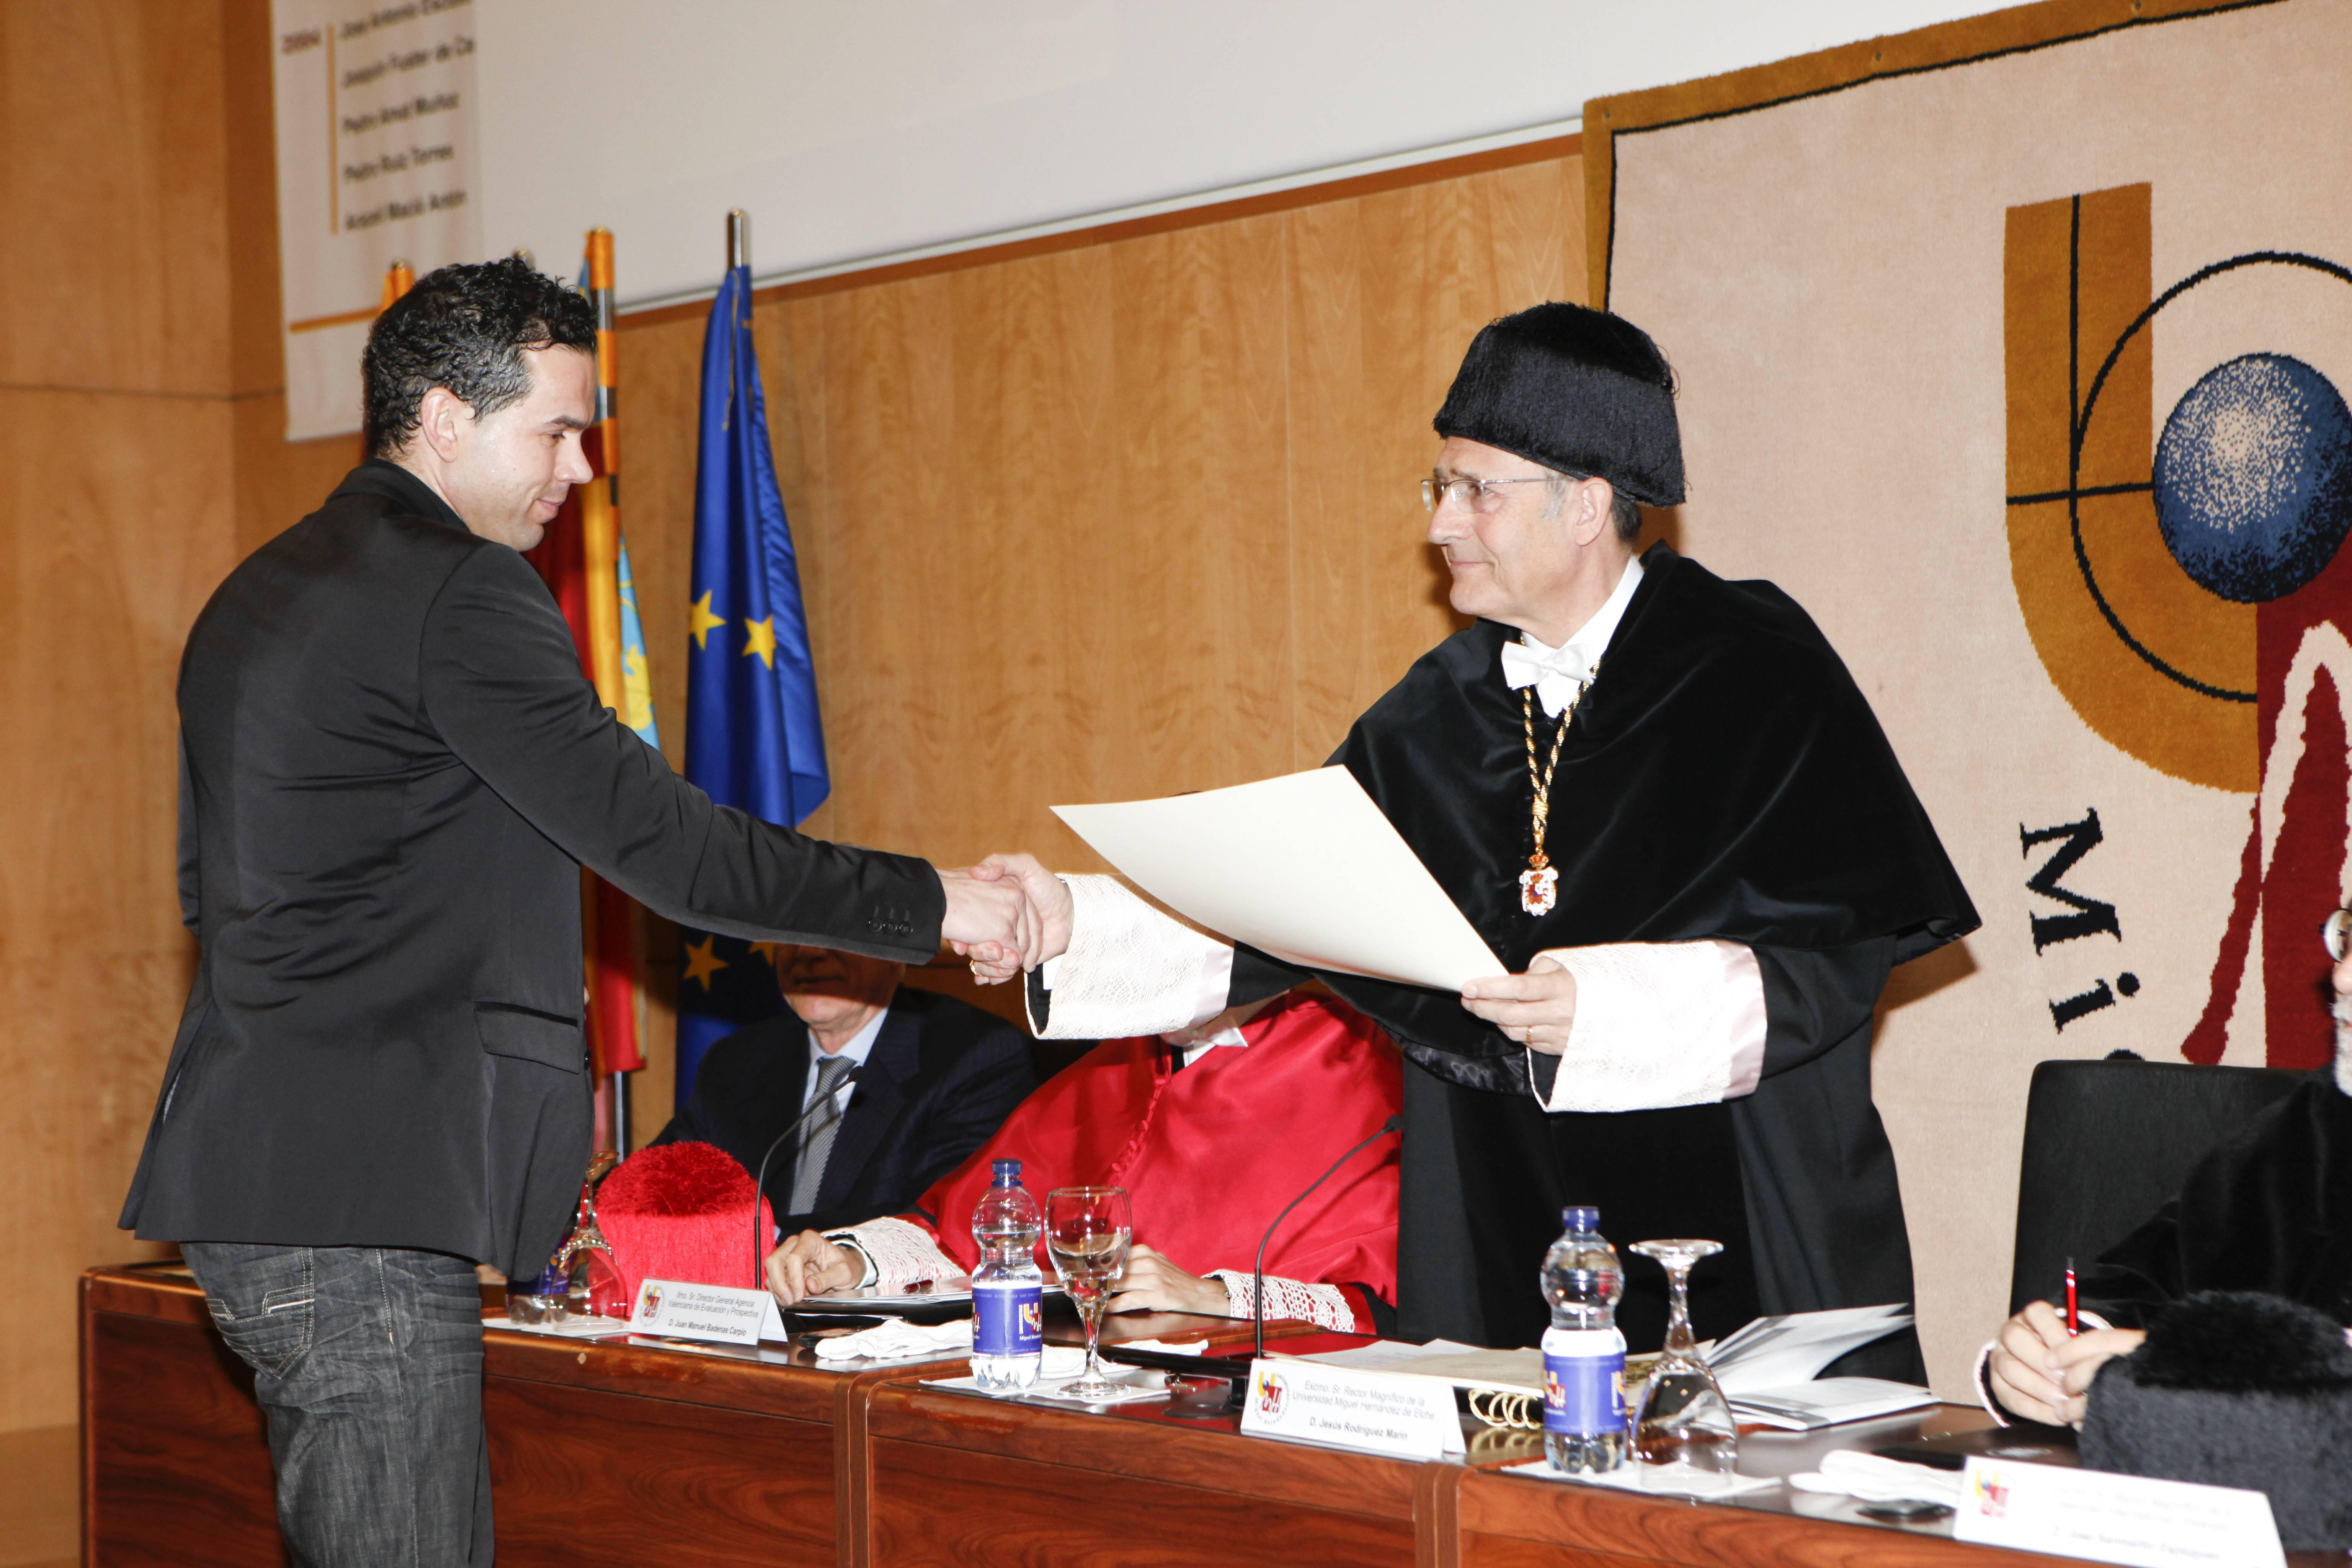 doctor-honoris-causa-luis-gamir_mg_0907.jpg